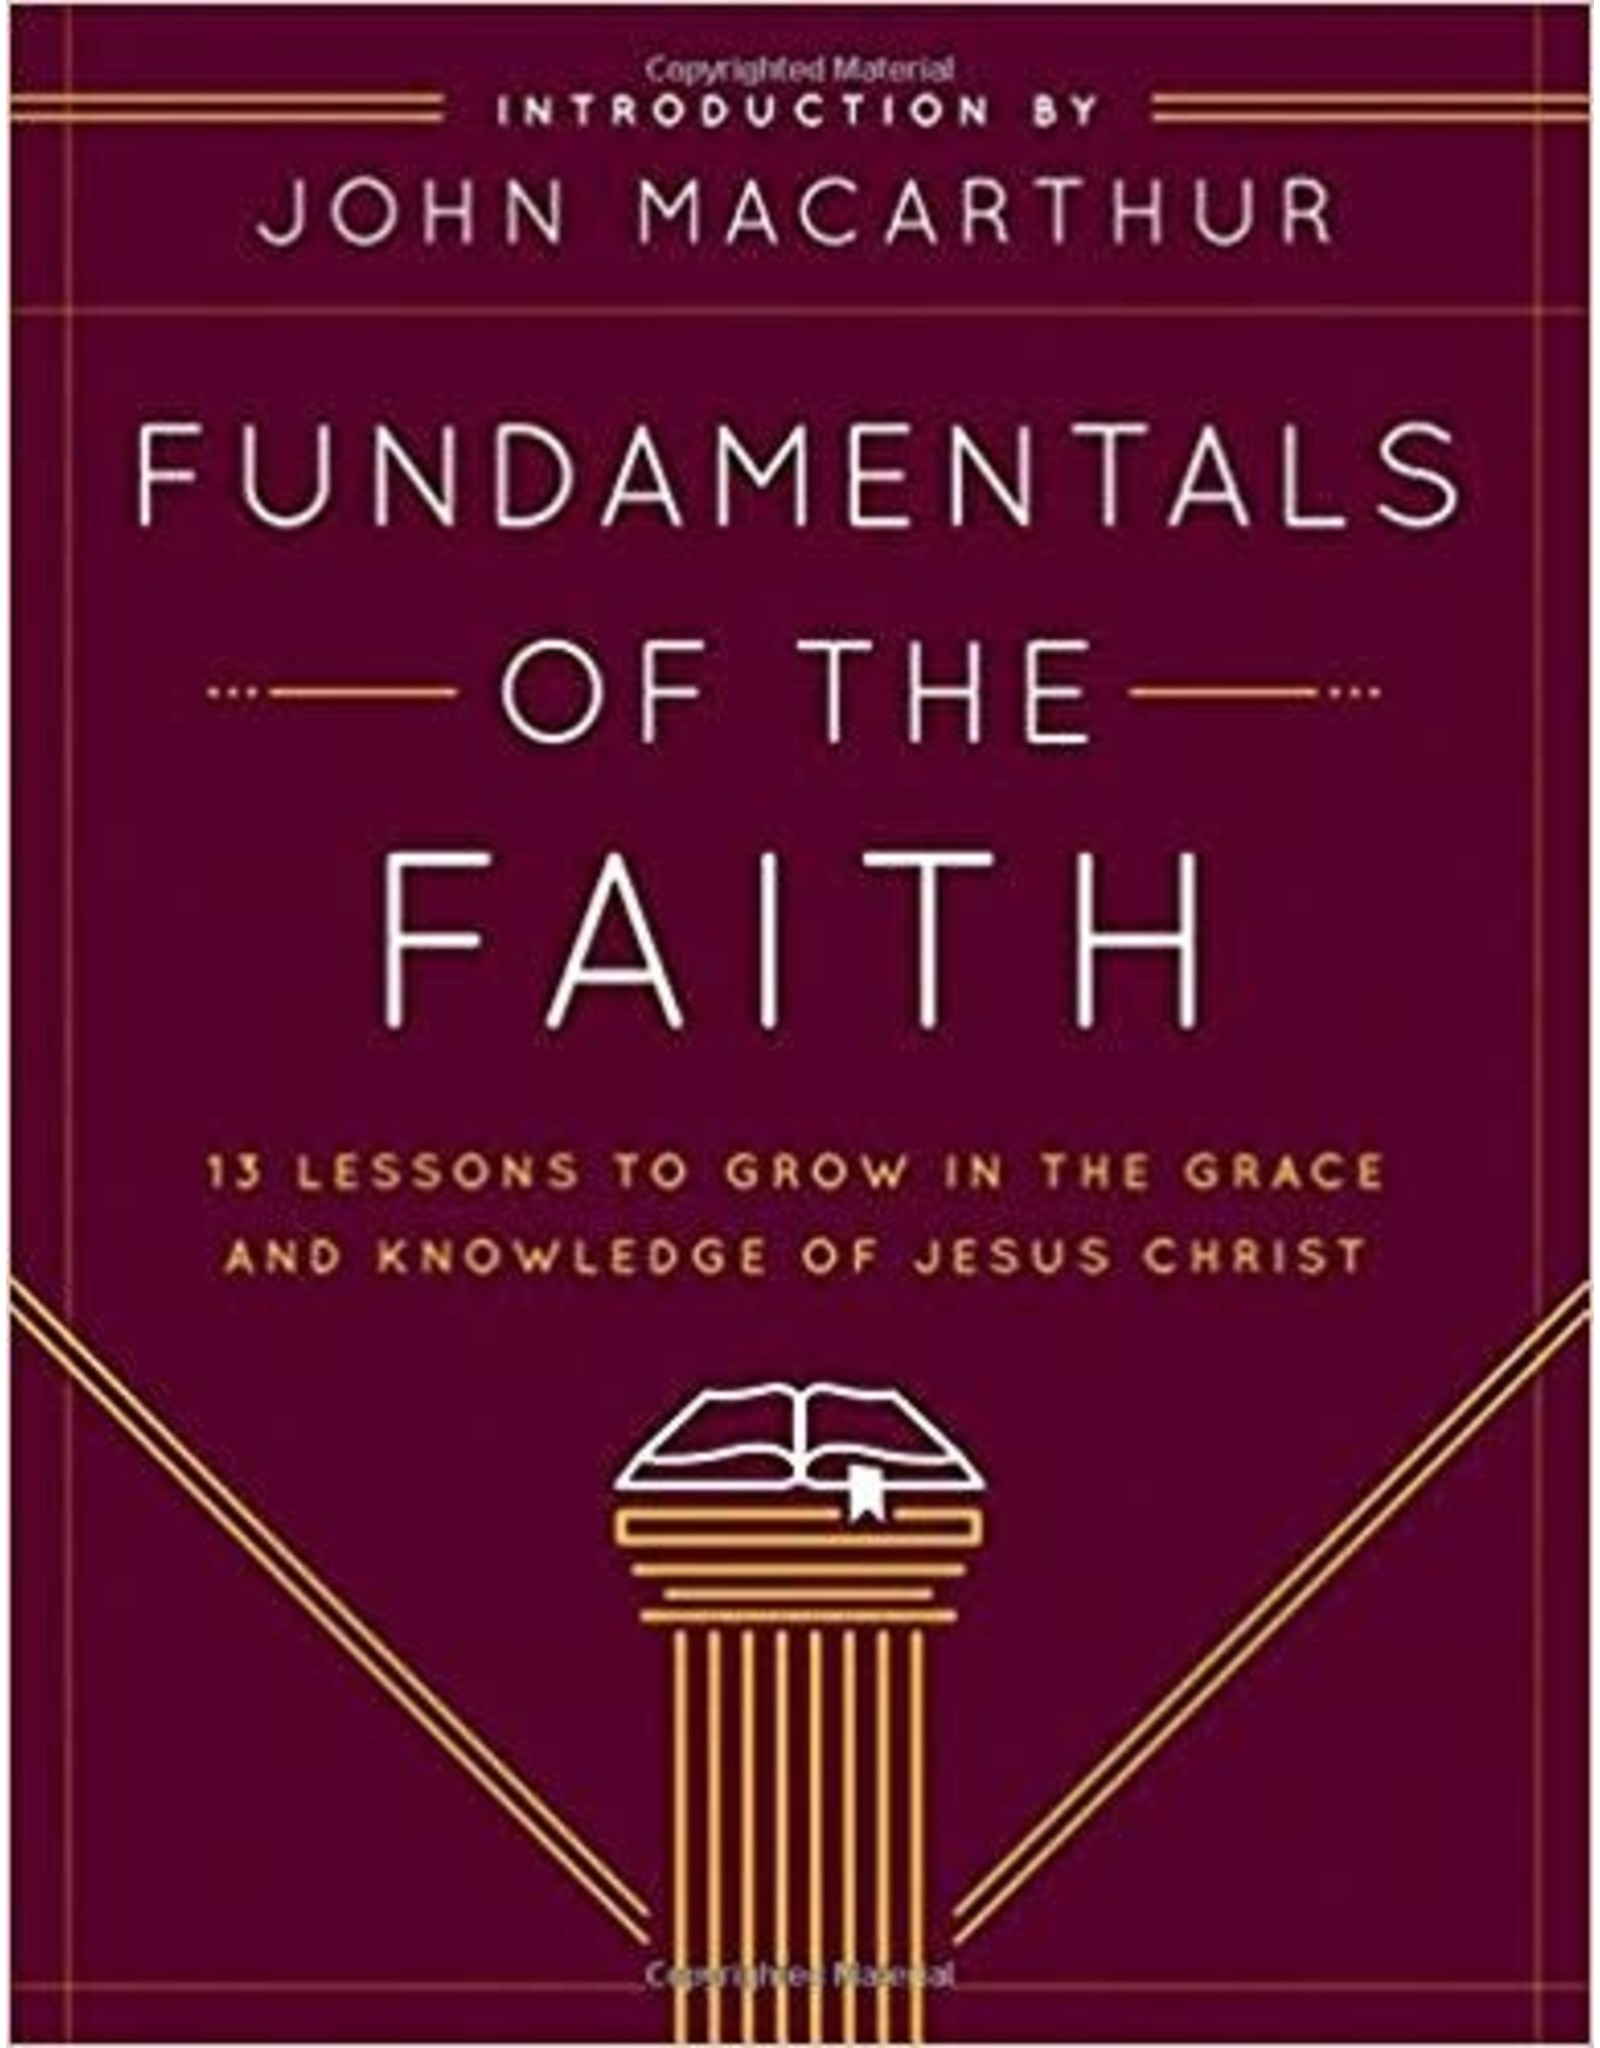 Grace Church Fundamentals of the Faith - Workbook